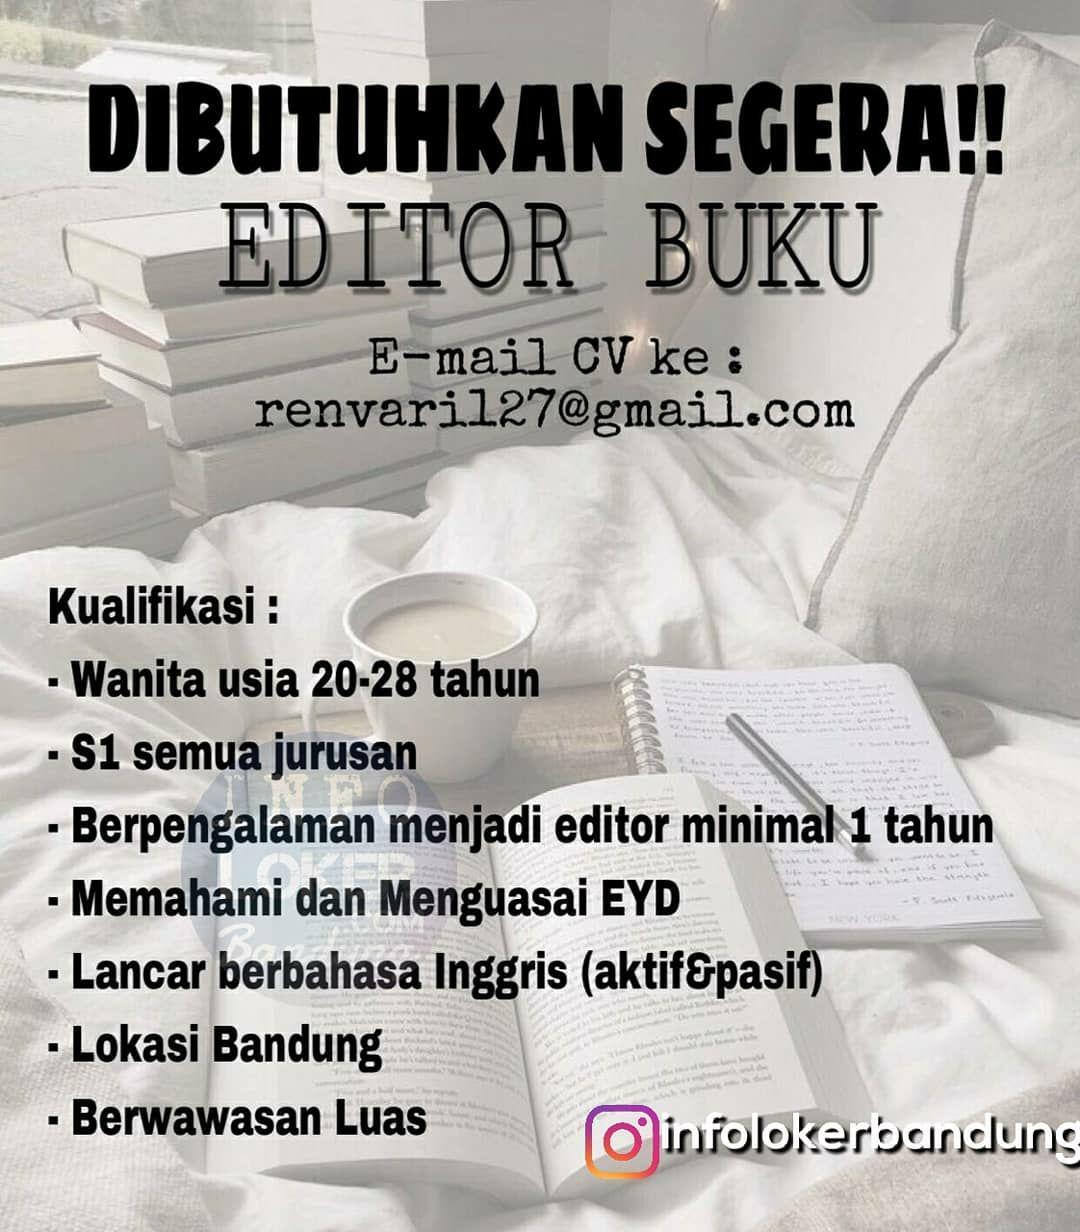 Lowongan Kerja Editor Buku Bandung Oktober 2018